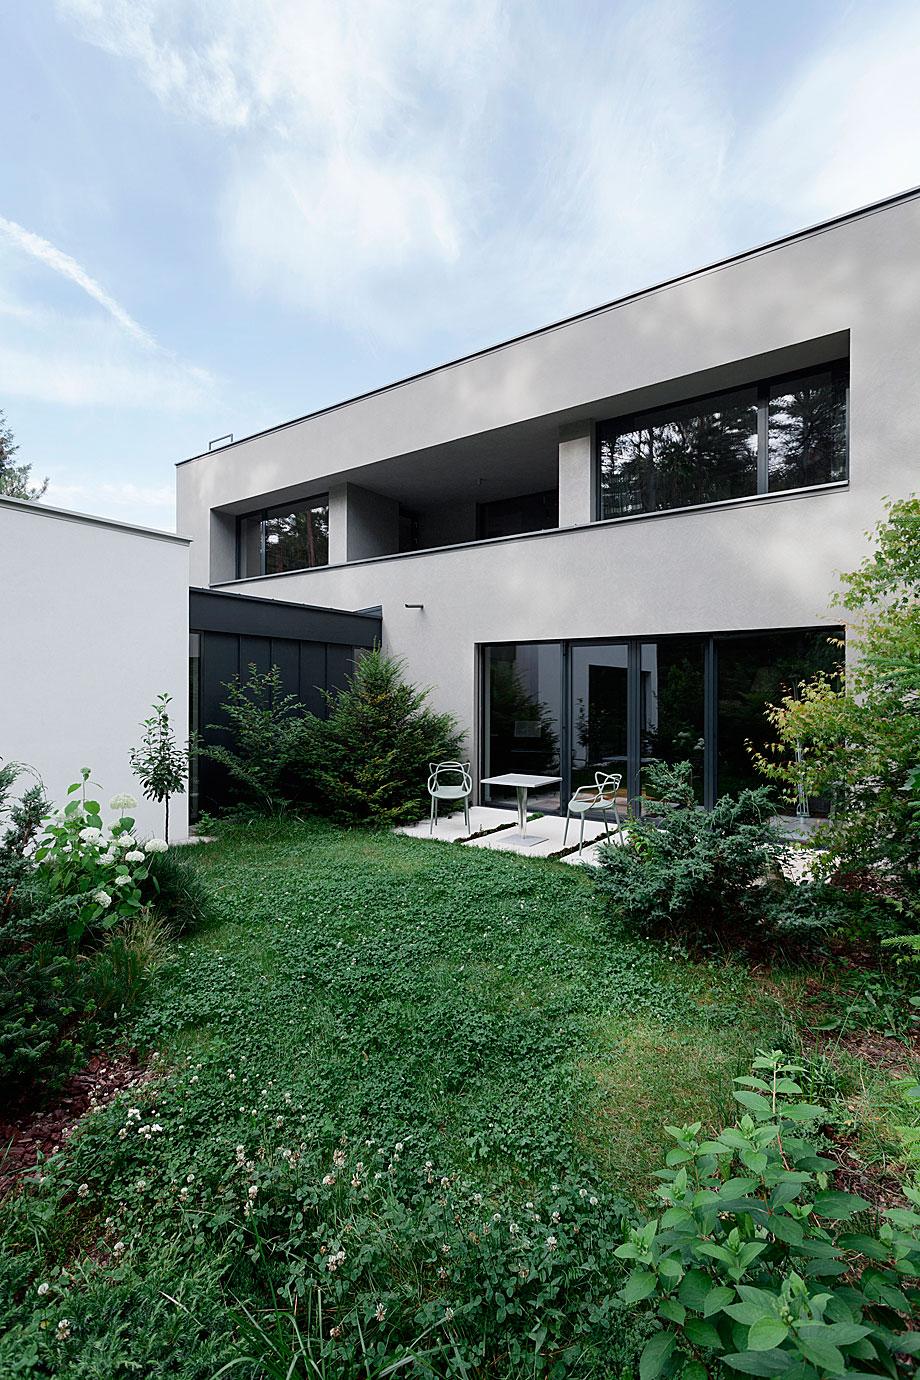 casa-unifamiliar-klanovice-adr-architects-18